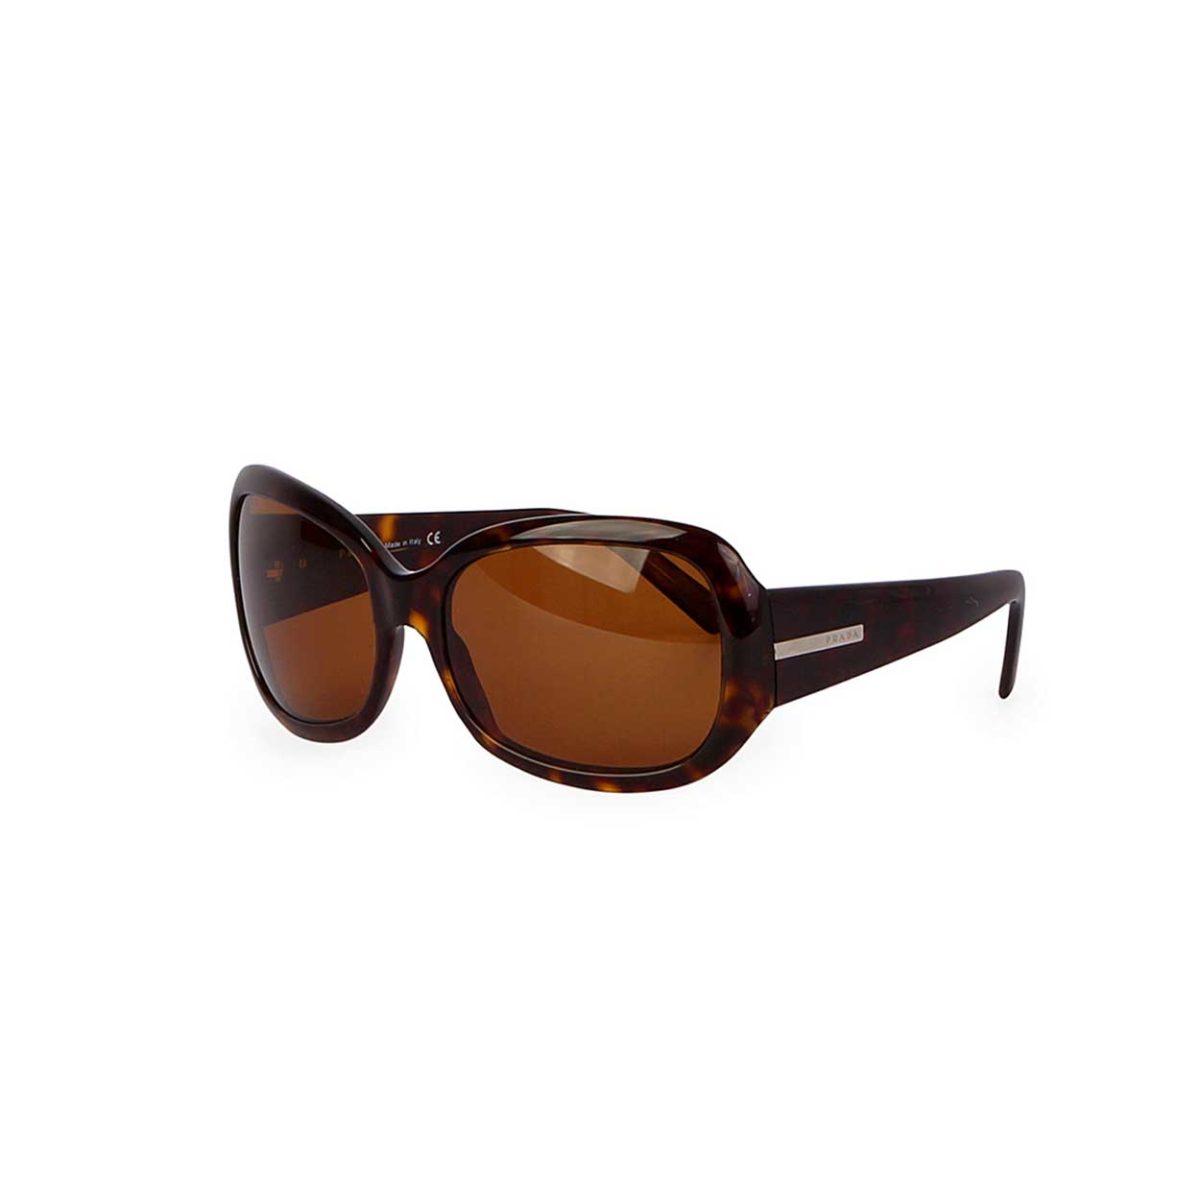 5afab0ae2ecd PRADA Oversized Sunglasses Brown SPR 13F | Luxity